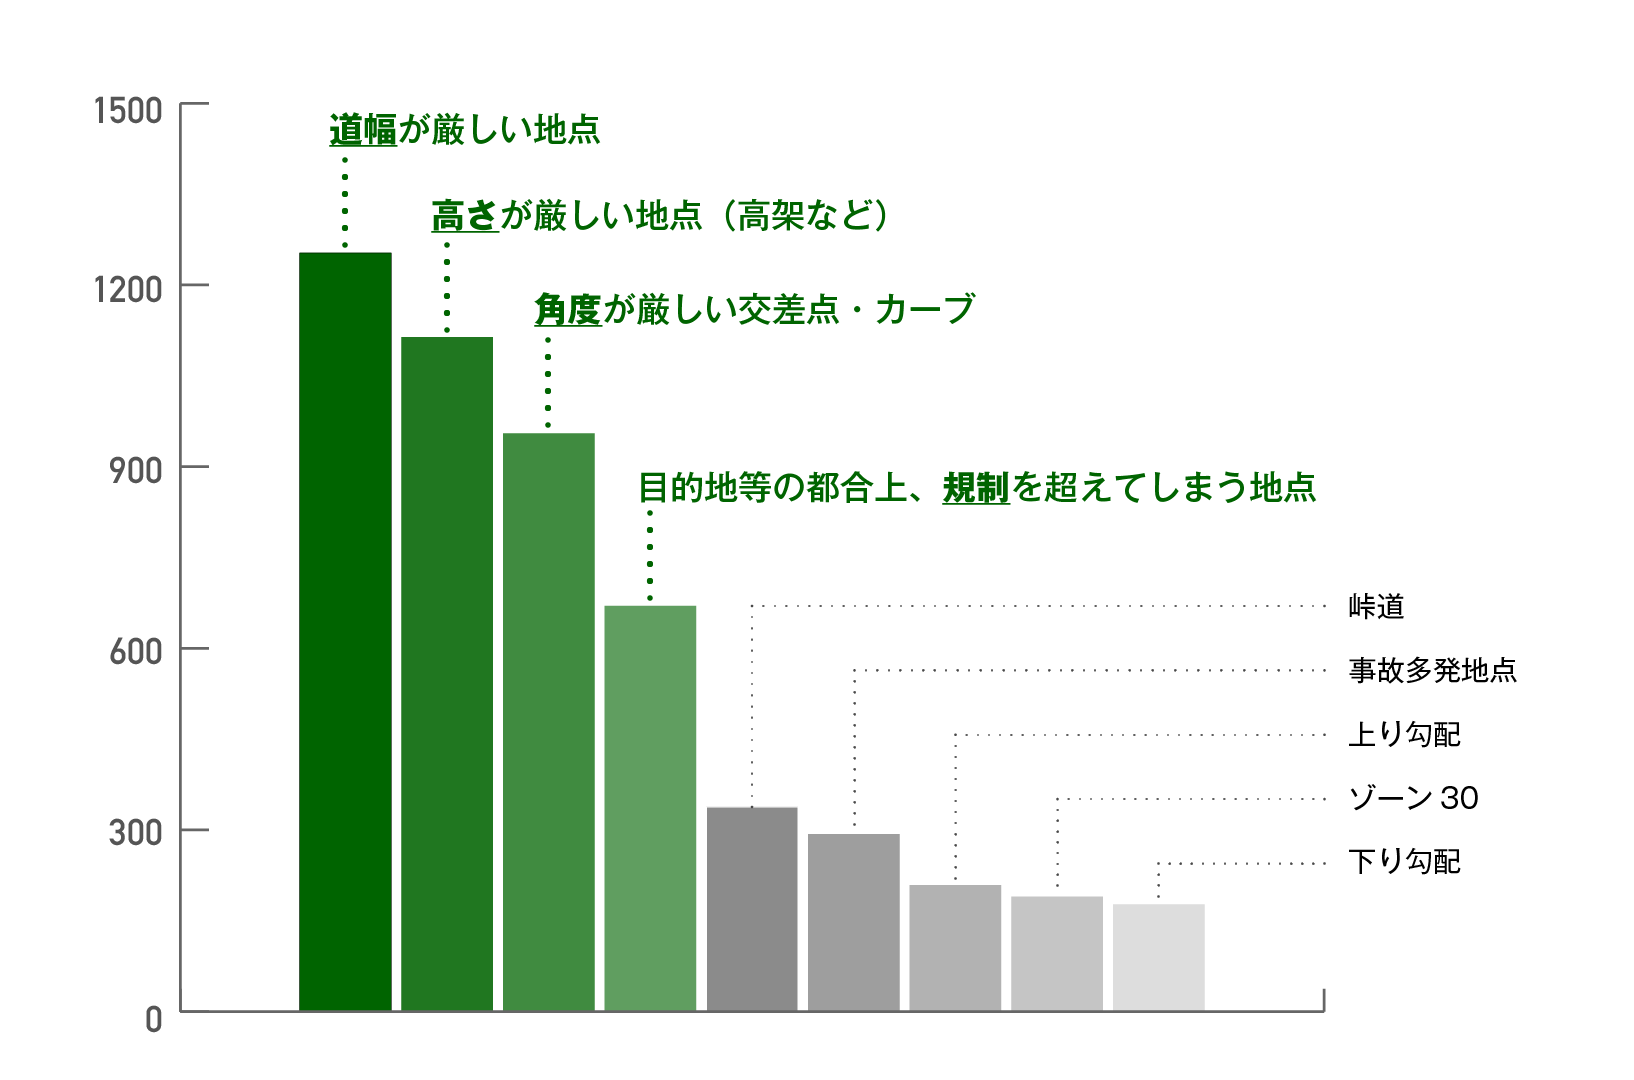 http://corporate.navitime.co.jp/topics/3880a63d2d80defaa8afe7c64bbff75342fb6b11.png